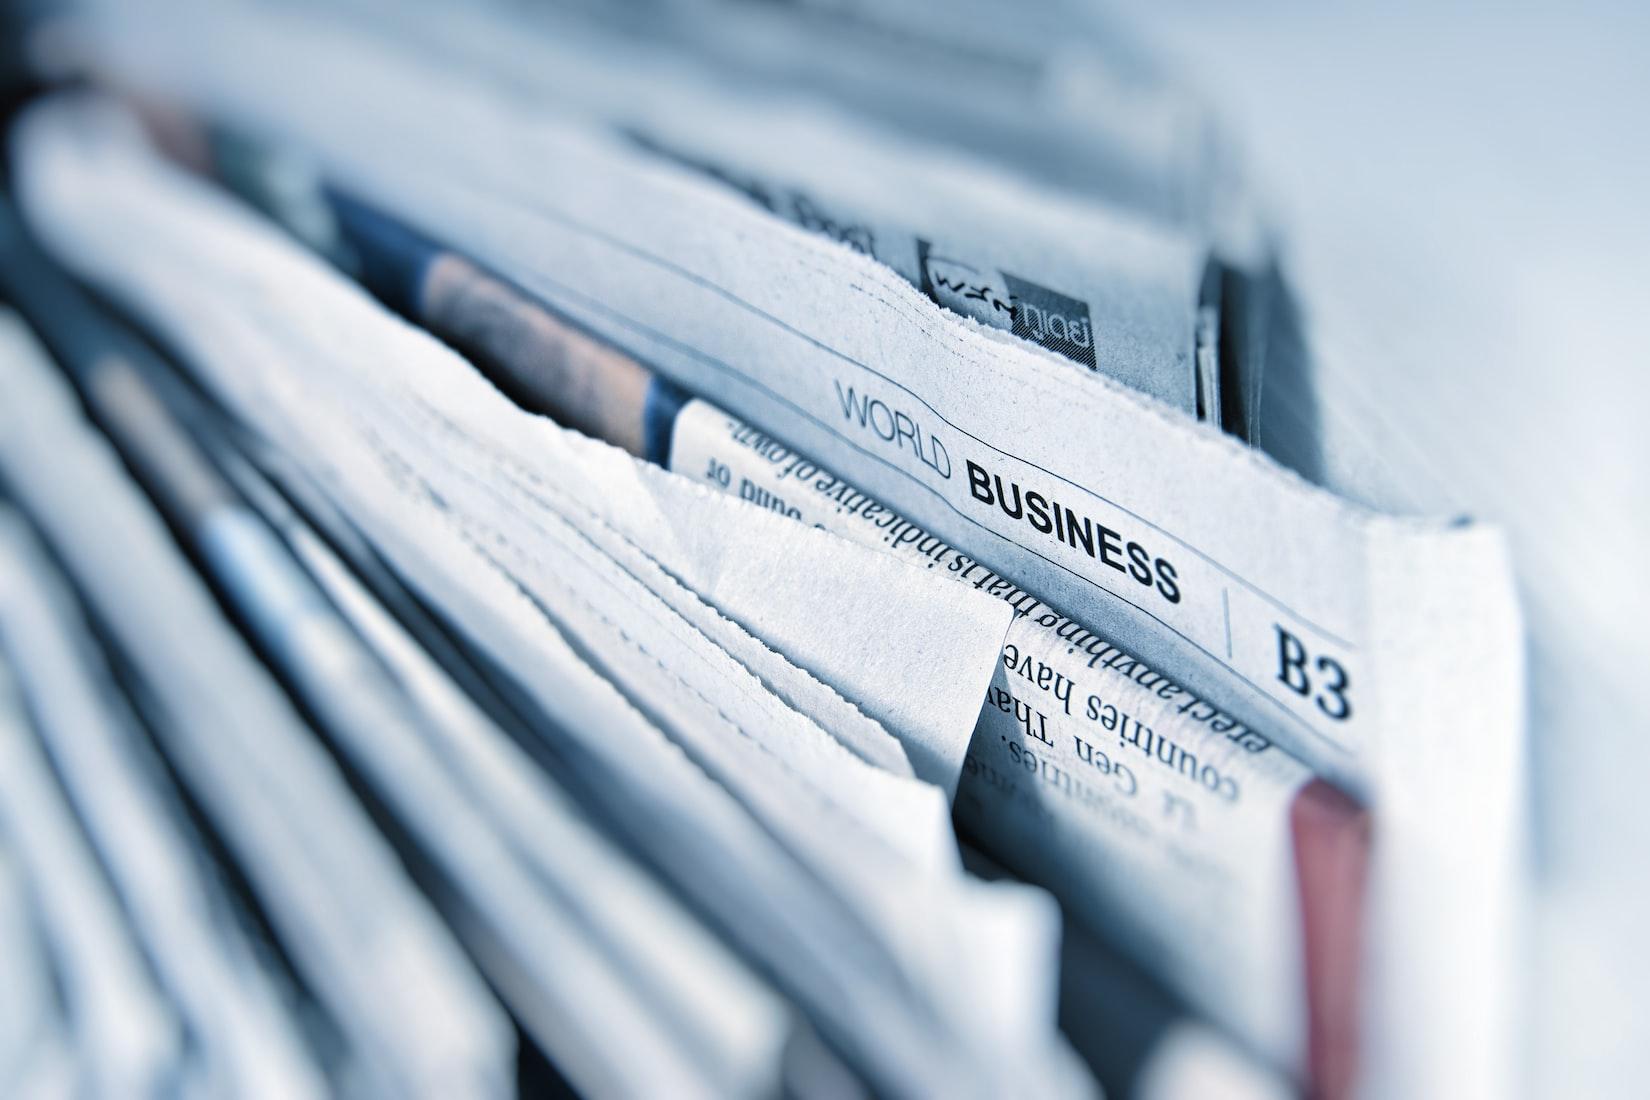 Ayala Pharmaceuticals Inc Shares Close the Week 20.9% Higher - Weekly Wrap